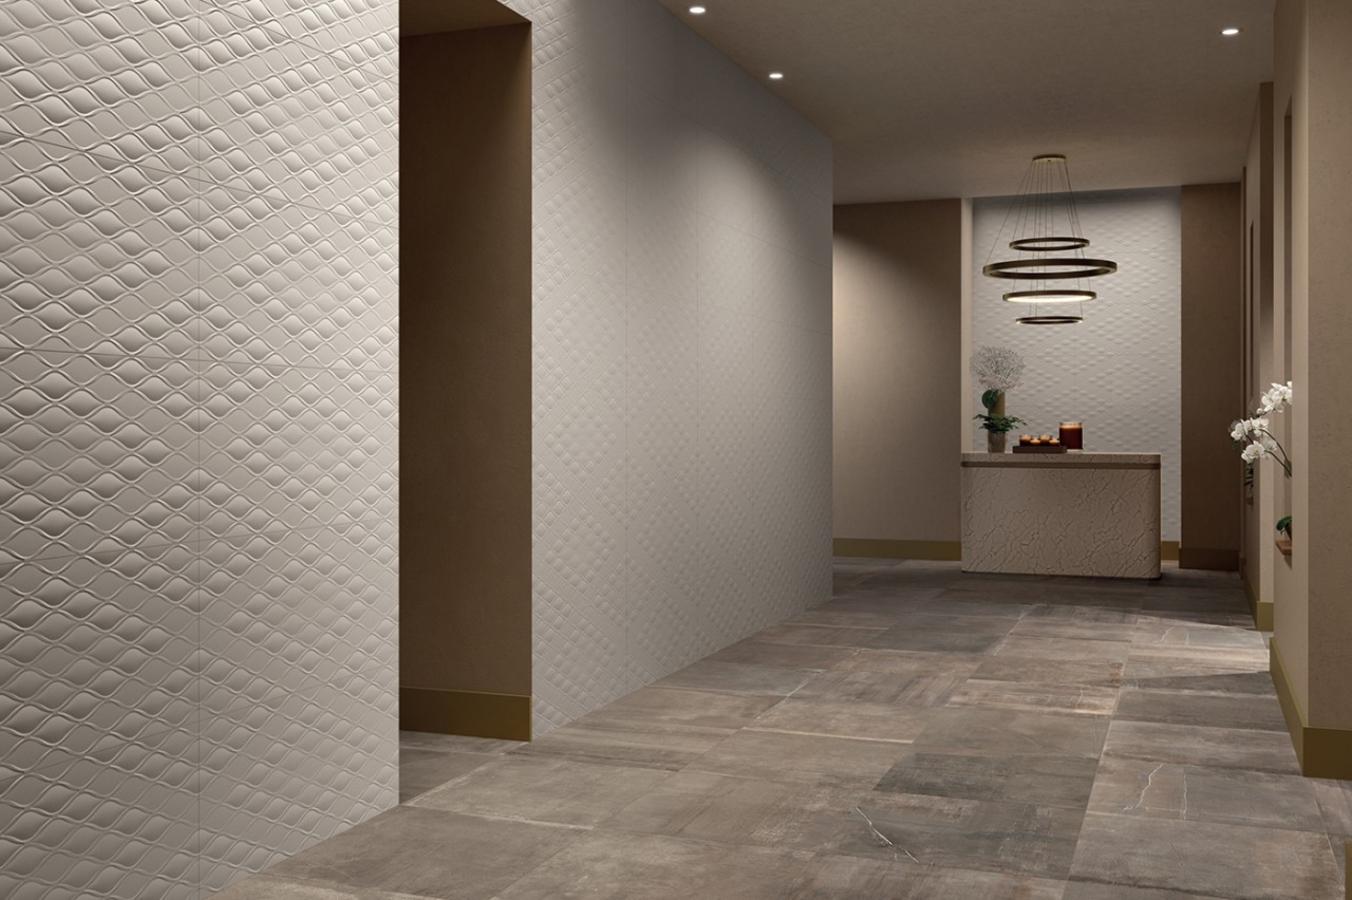 Marca Corona Tegels : Keramische tegels en porseleinen tegels 4d van marca corona. tile